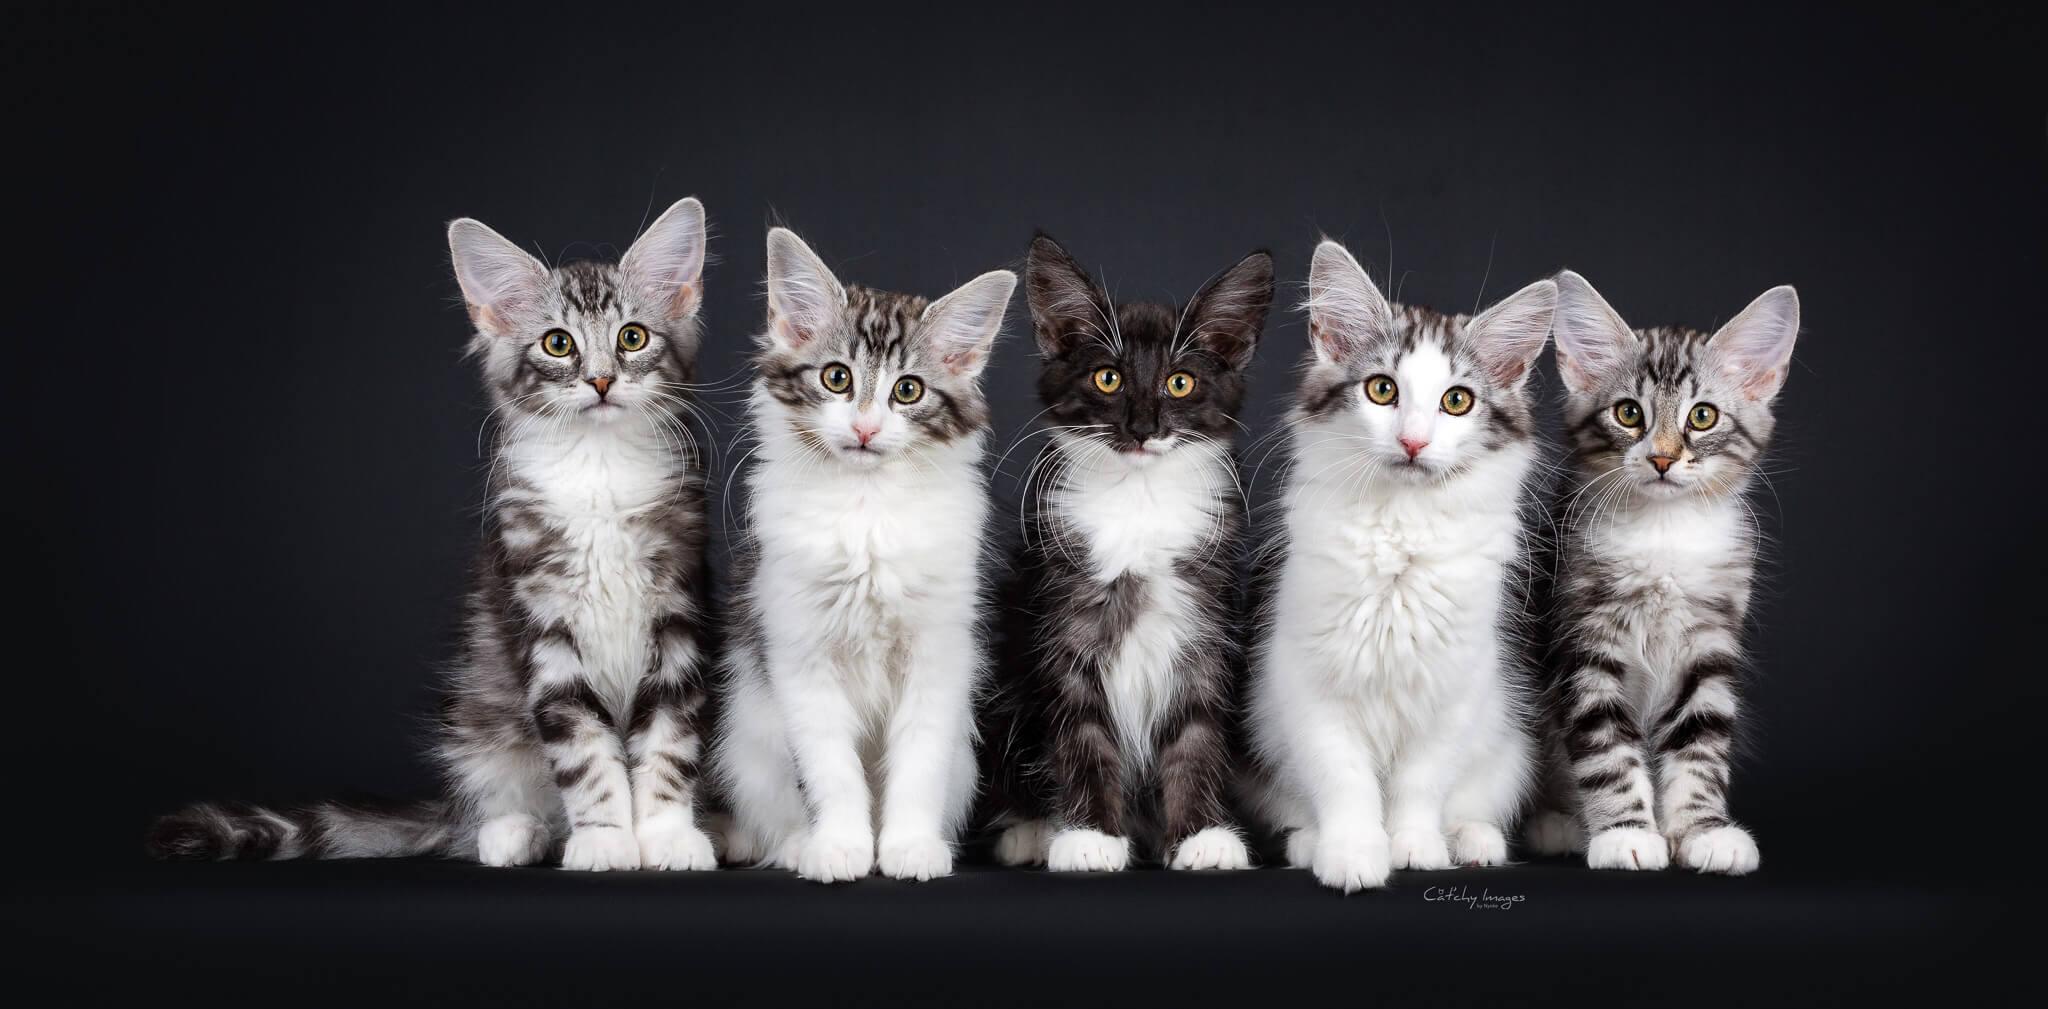 DK Silverleaf's Warcraft Dragons kuld • DK Silverleaf • Norsk Skovkatte • Norwegian Forest cats